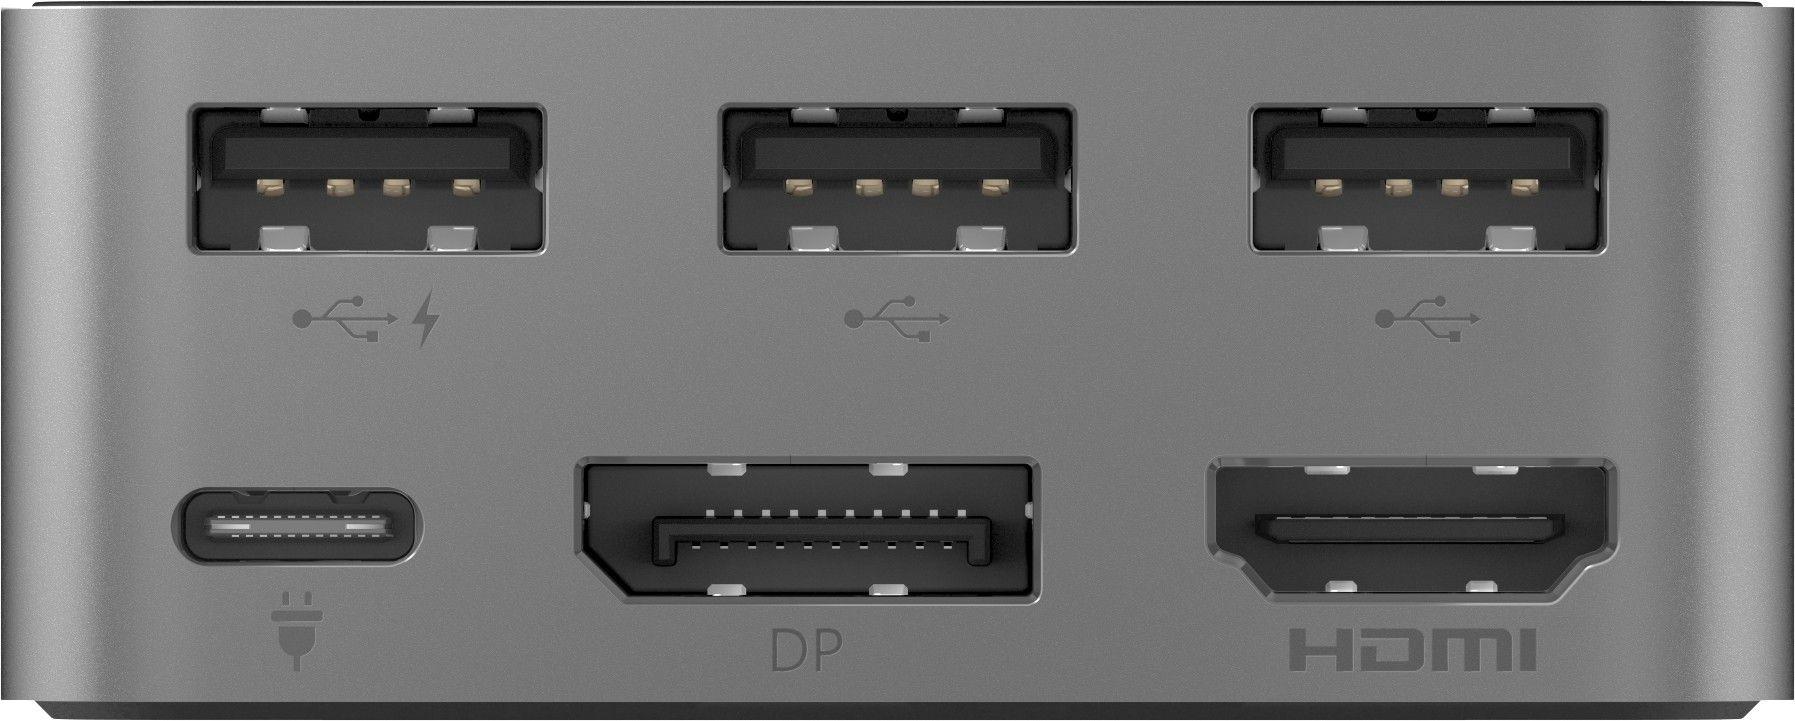 Док-станциия Microsoft Display Dock HD-500 - 1